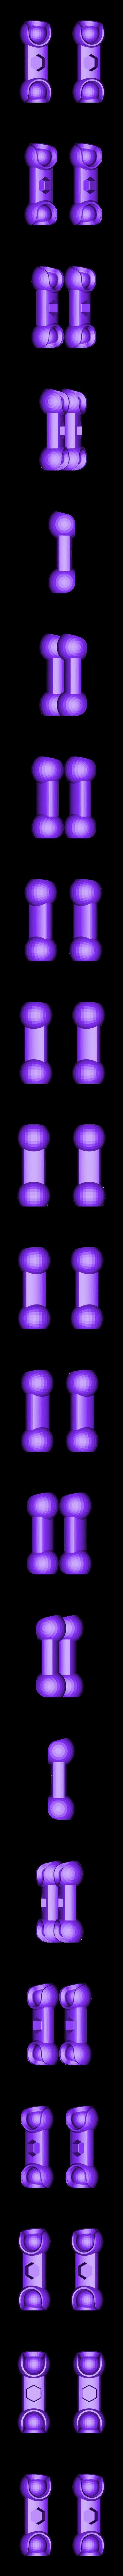 "modibot-remix-arms-lower.stl Download free STL file Modibot action figure ""easy print"" remix • 3D printer design, firebird"